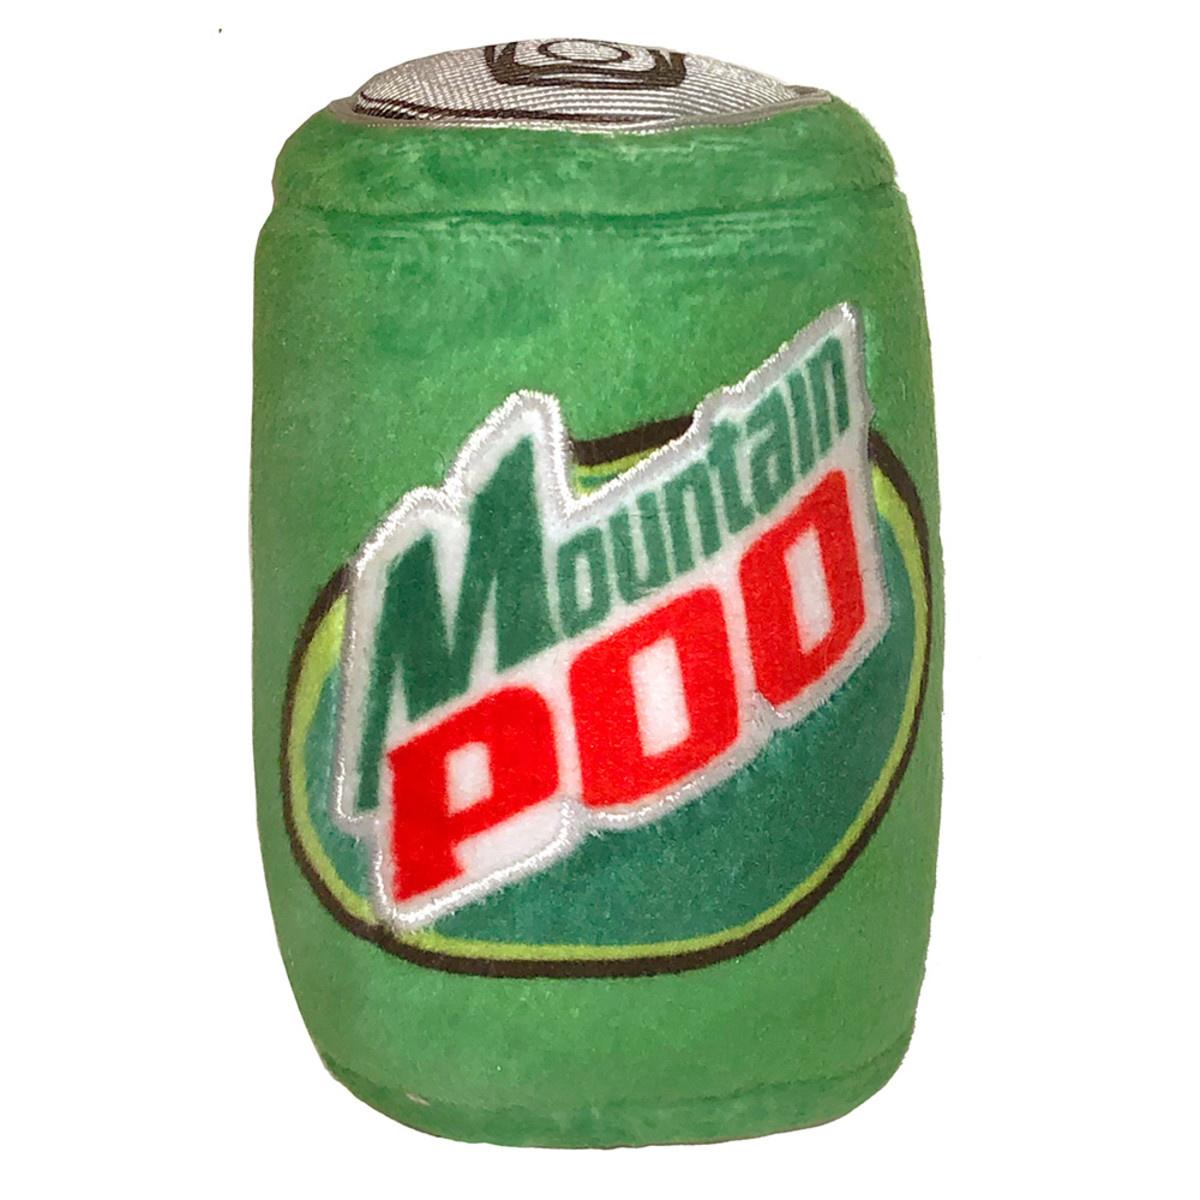 Lulubelle's Power Plush Mountain Poo